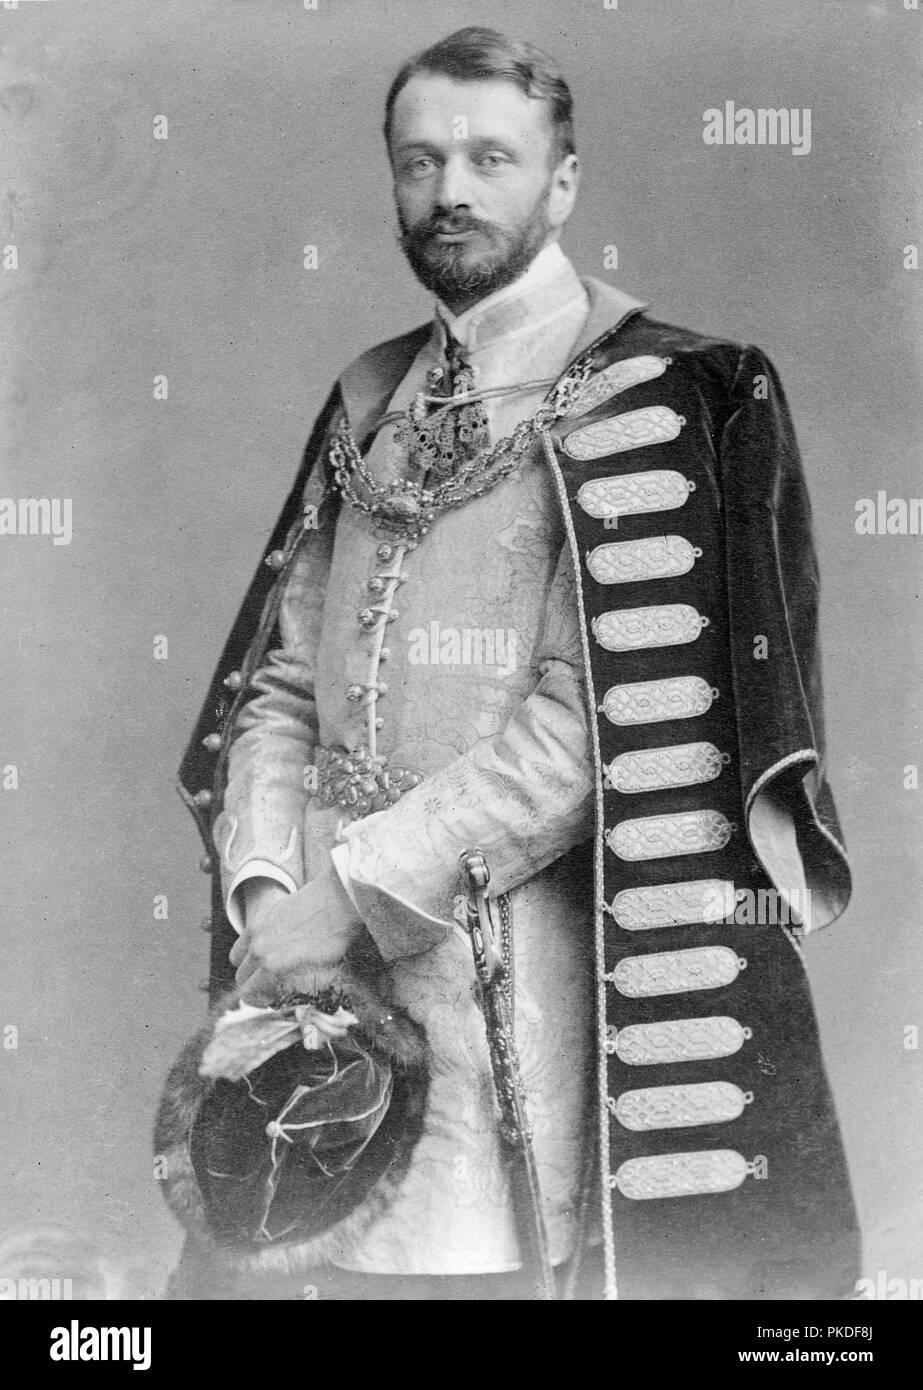 Le jeune Comte Andrássy Gyula (1860-1929) Homme politique hongrois Photo Stock